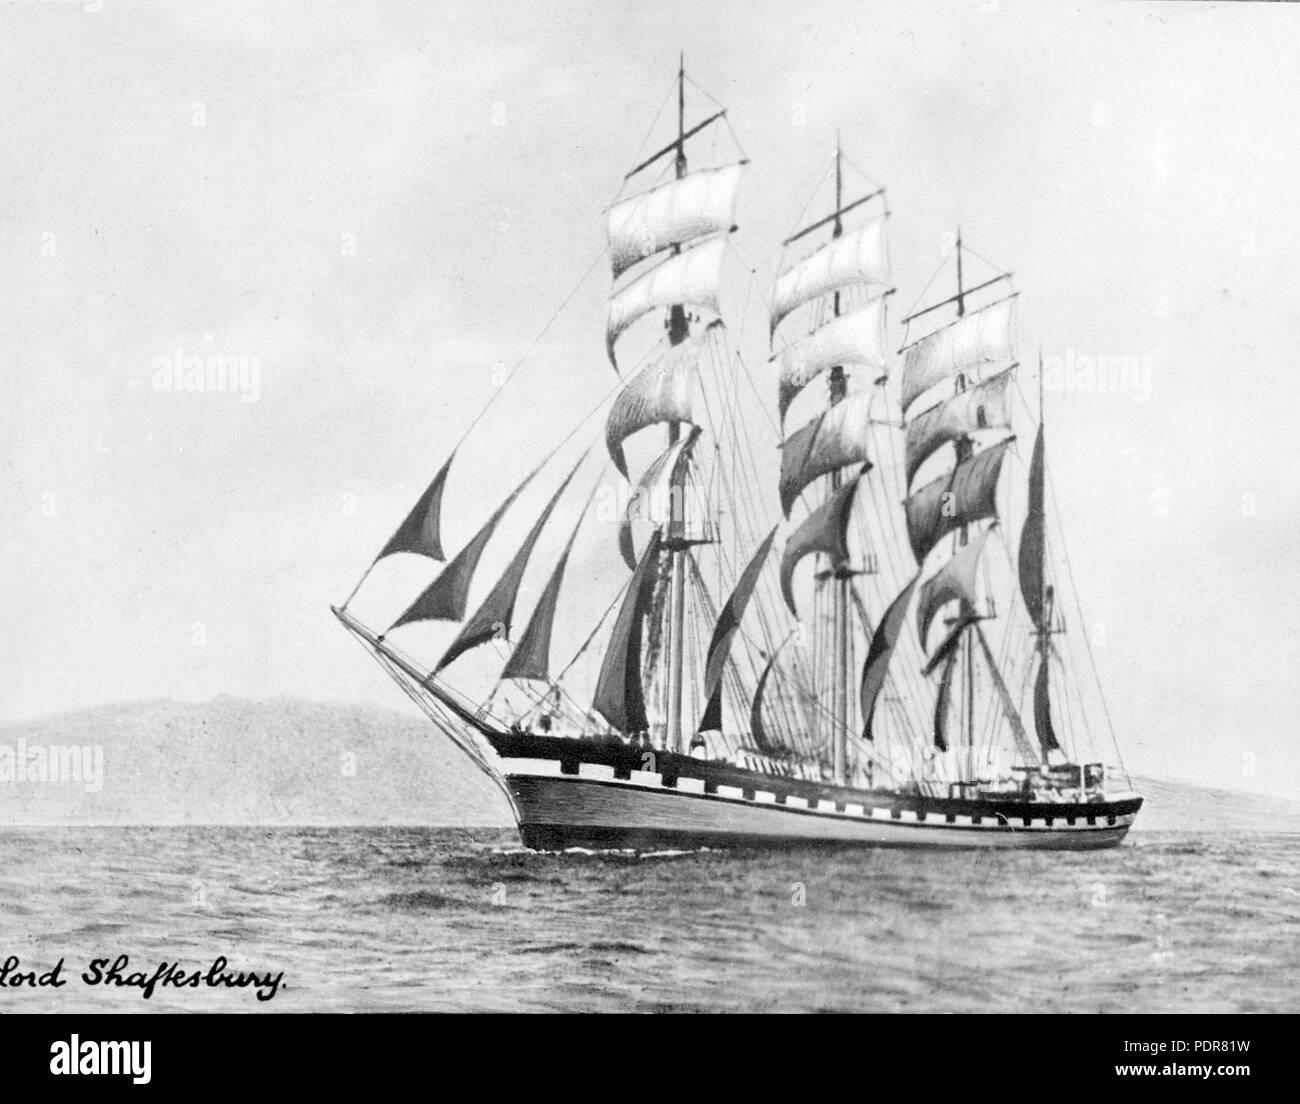 81 Lord Shaftesbury (ship, 1888) - SLV H99.220-3091 Stock Photo